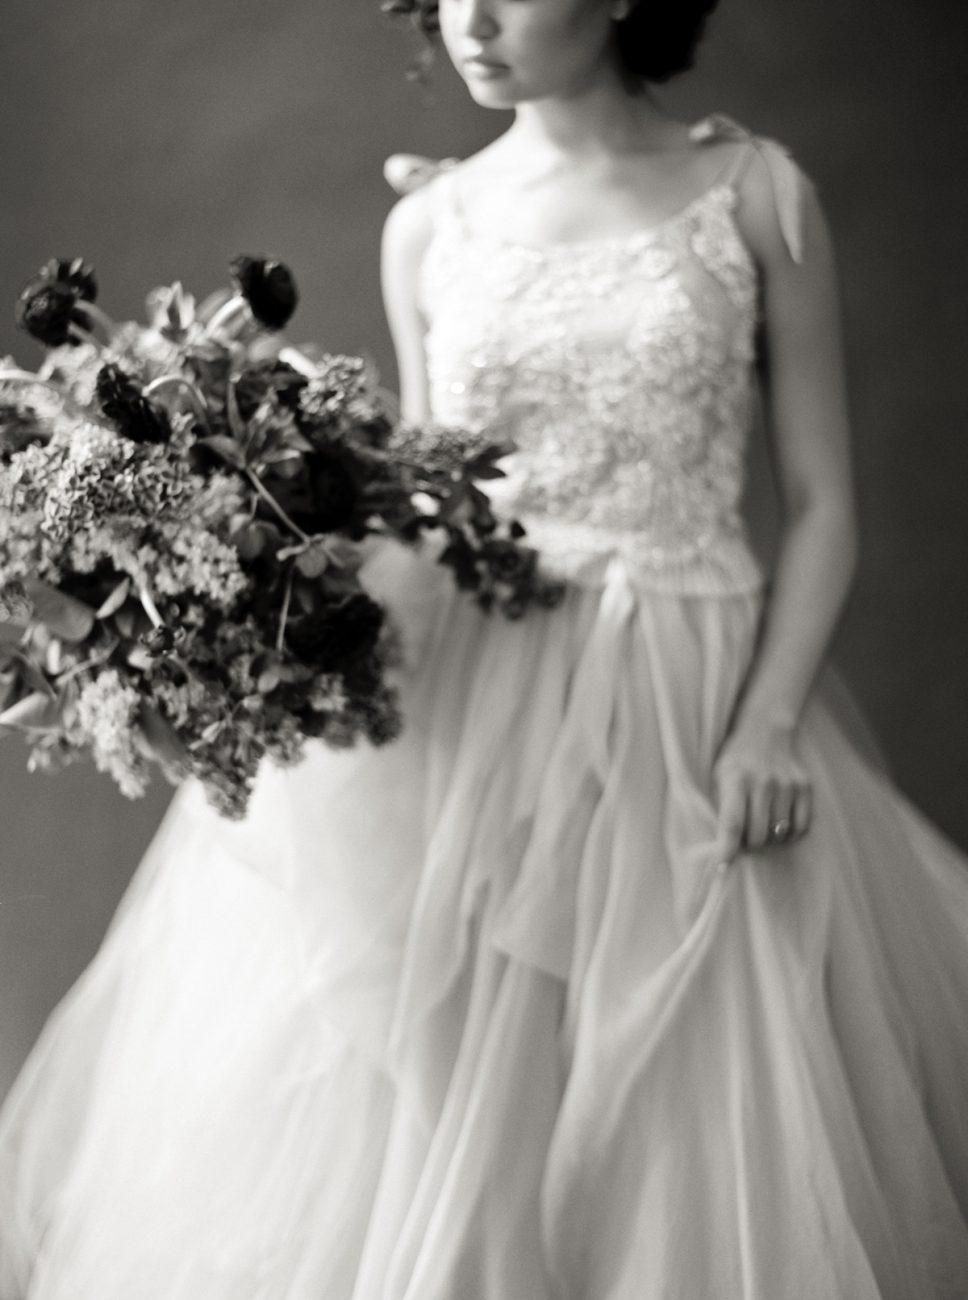 Moody Black Wedding Inspiration_black and white photo of bride